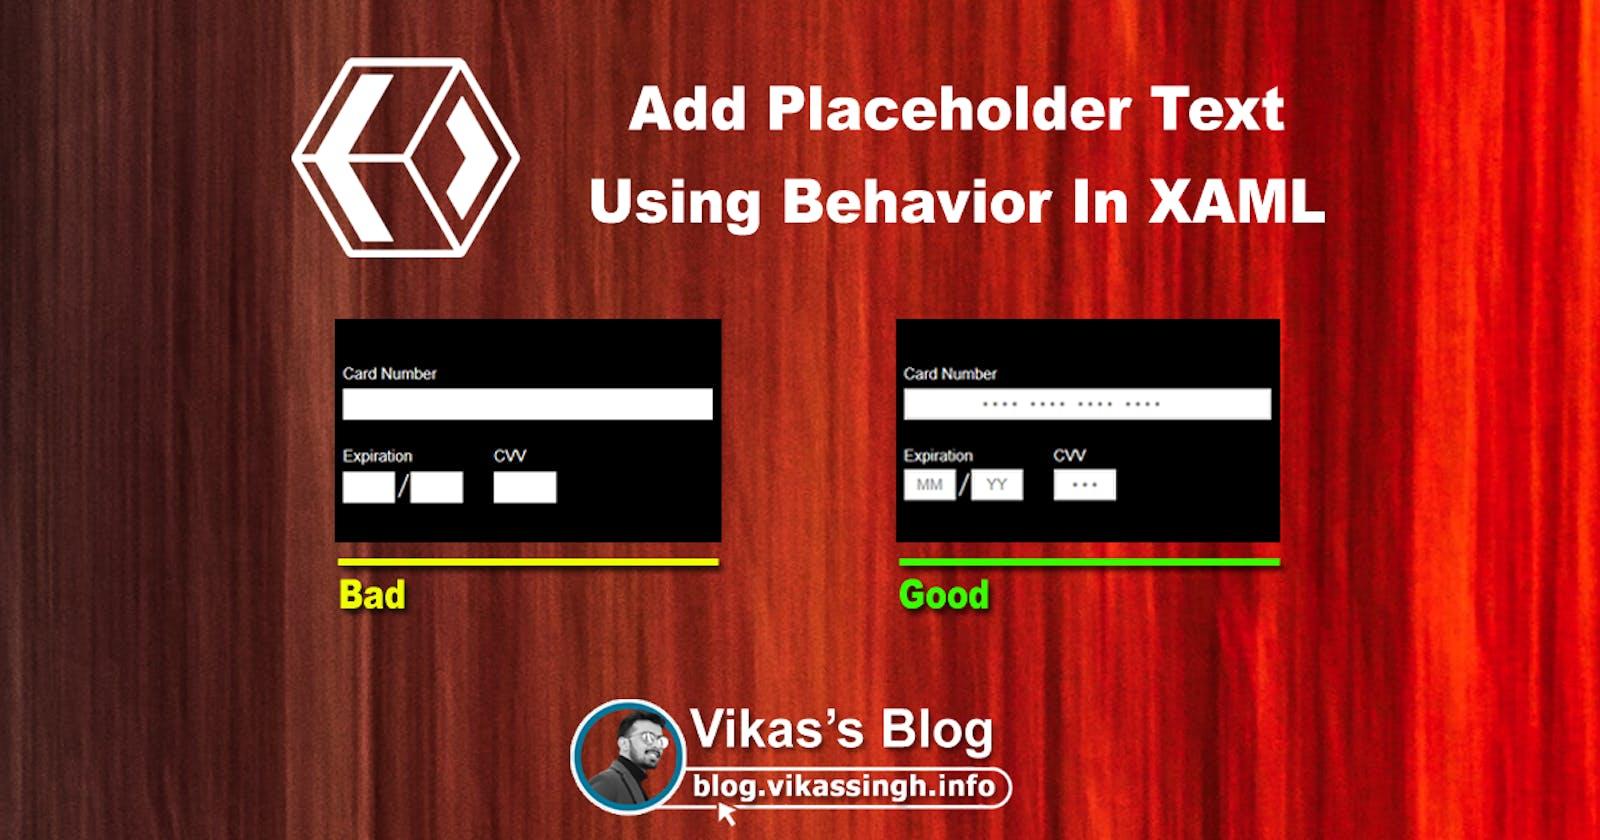 Add Watermark/Placeholder Text Using Behavior In XAML